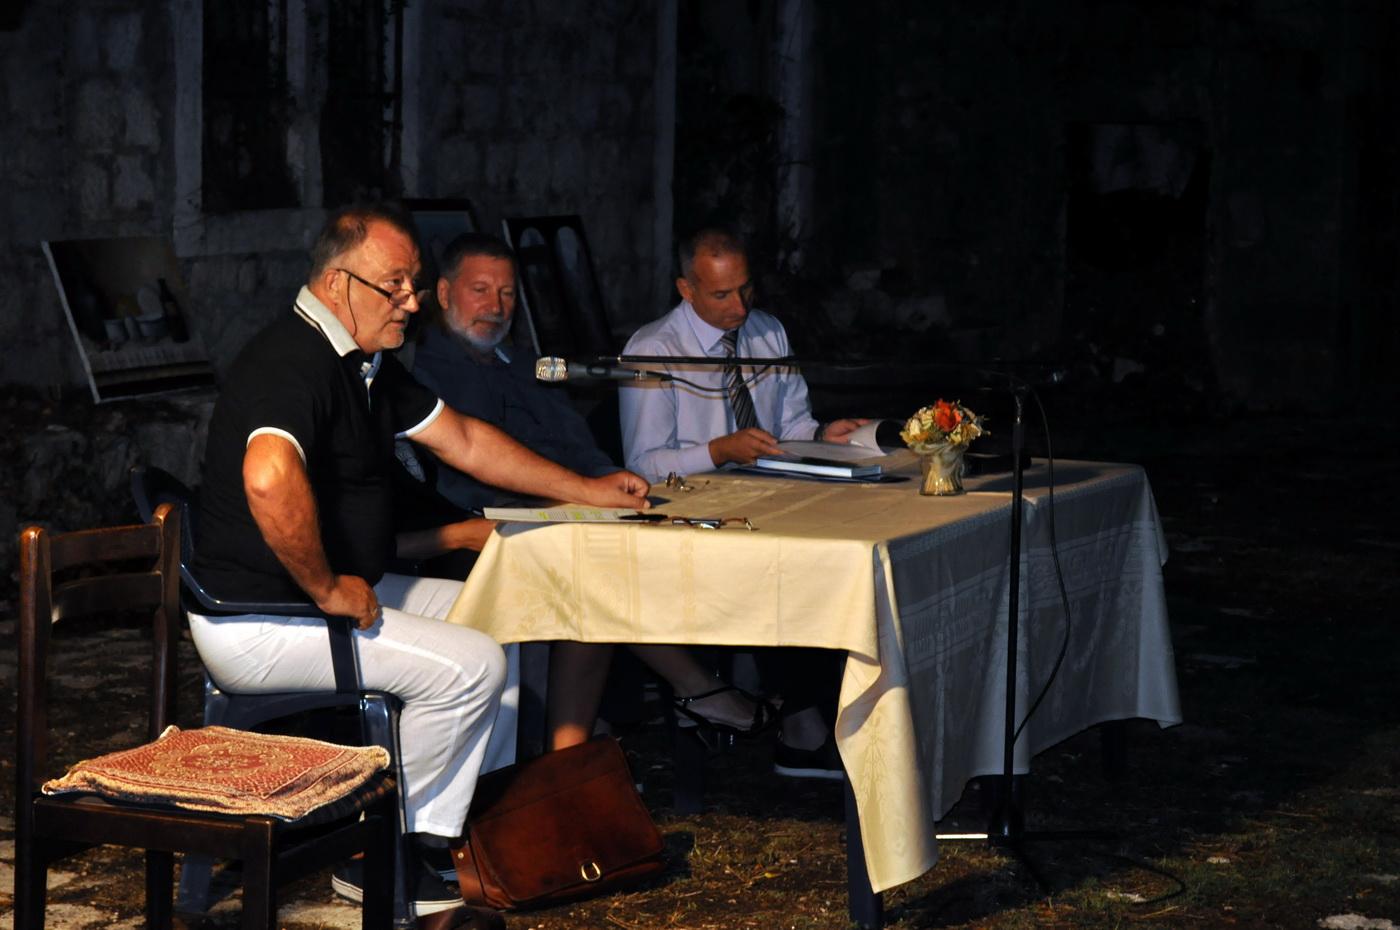 Risan - Veče kapetanskih poortodica Ivelić i Đurković